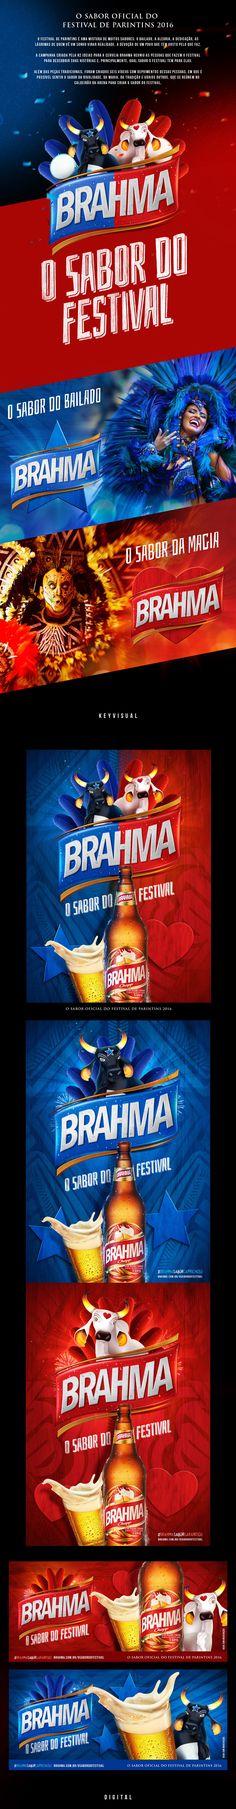 Cerveja Brahma - O Sabor do Festival on Behance